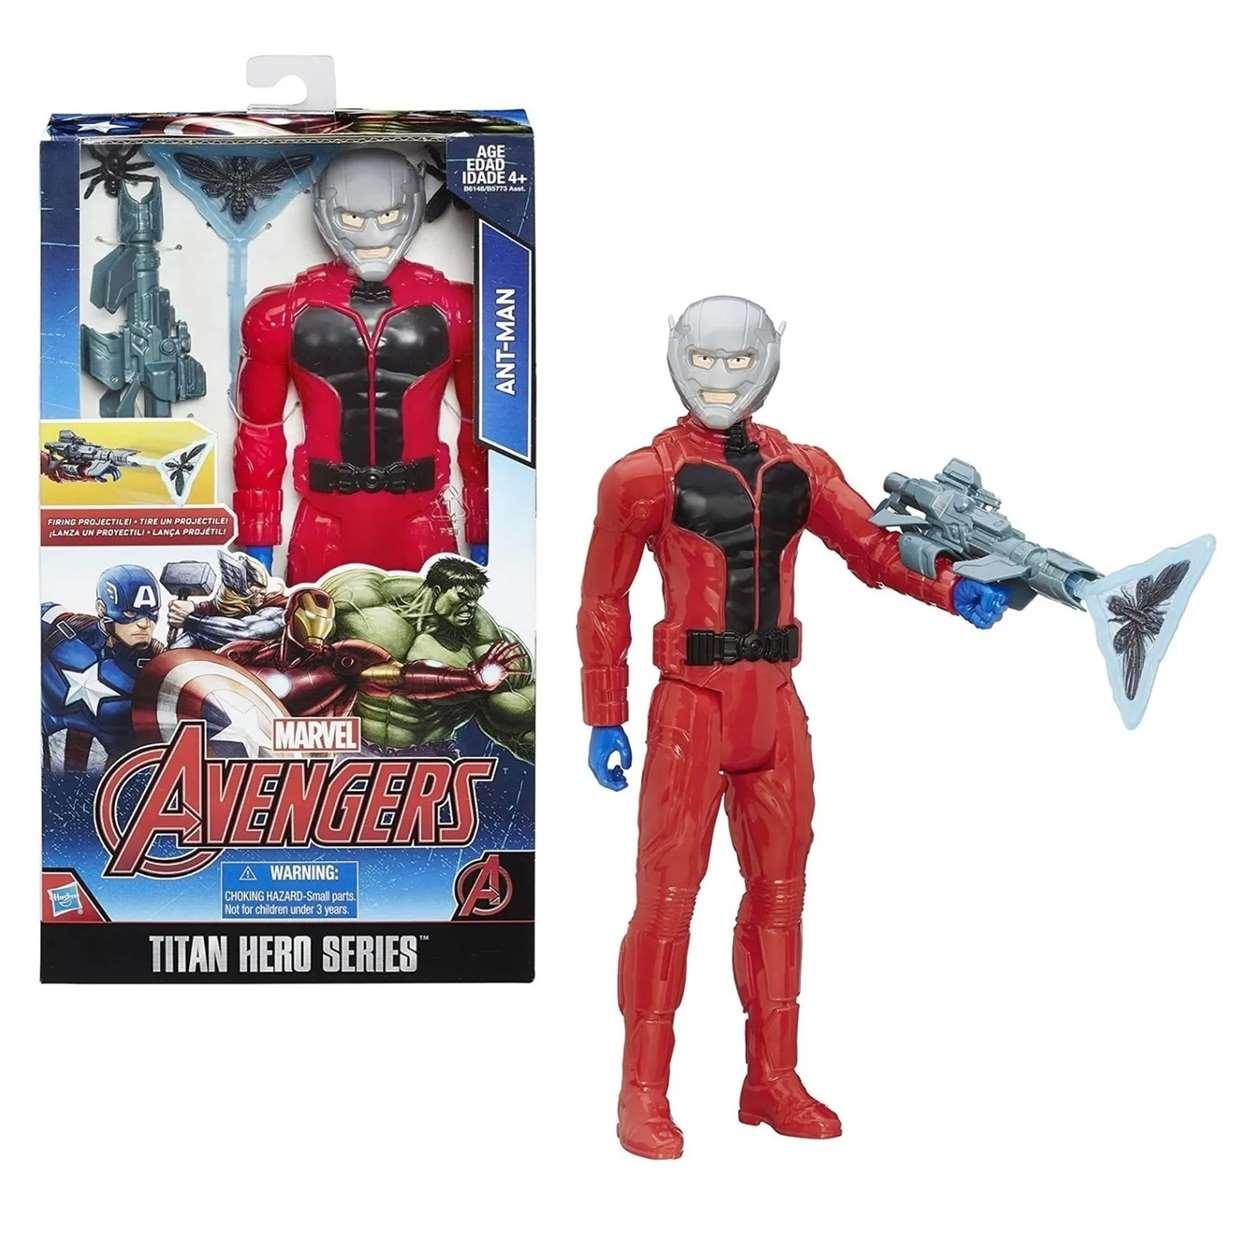 Ant Man Firing Projectile Figura Avengers Titan Hero 12 PuLG